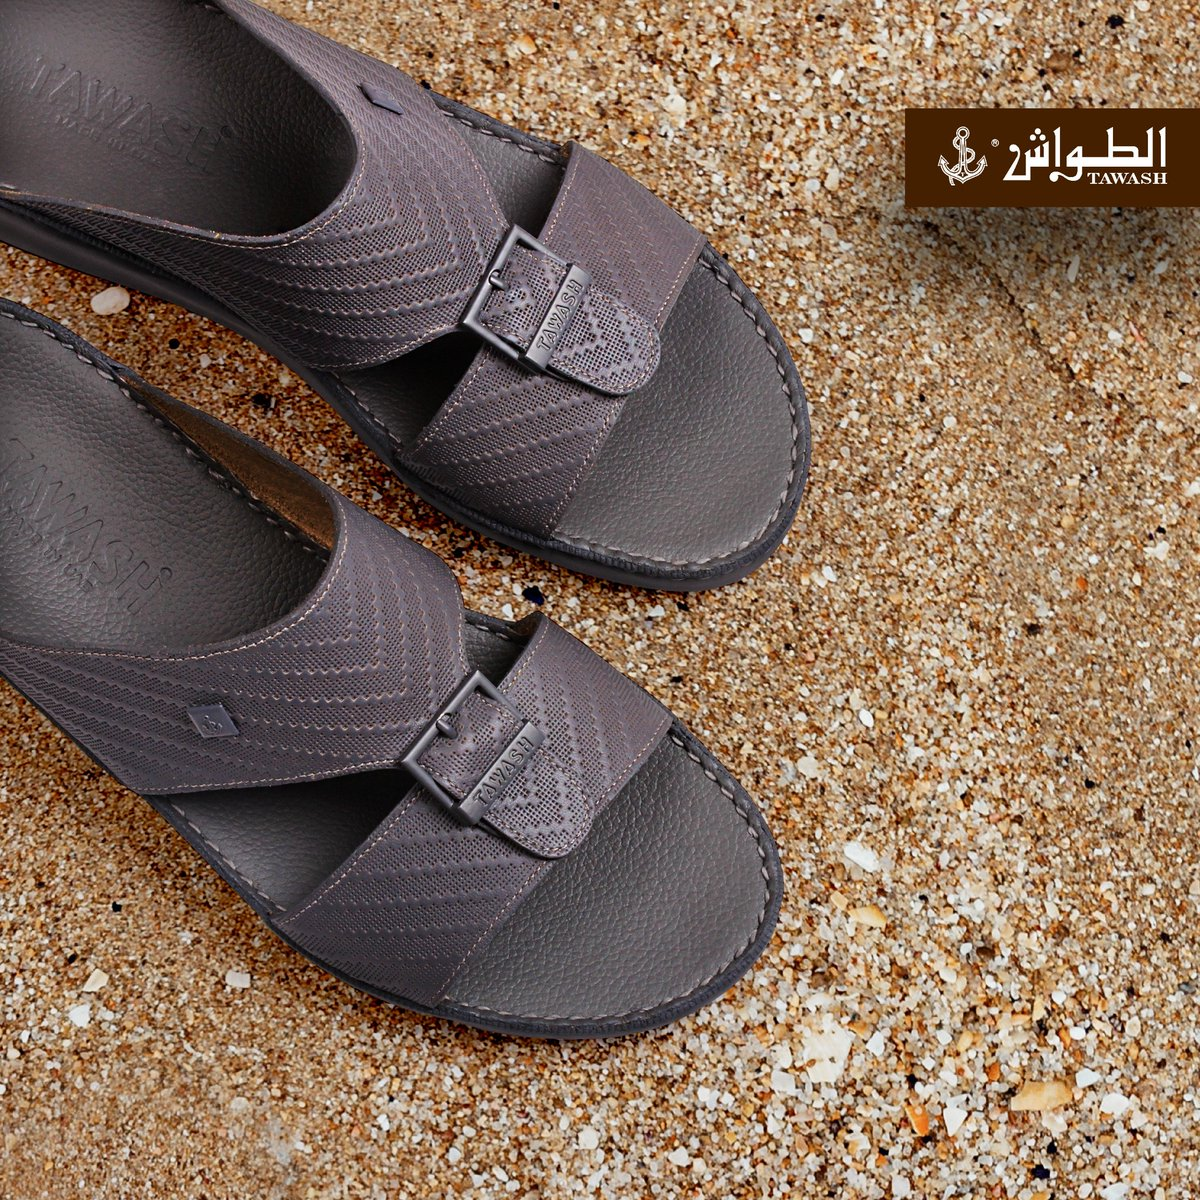 ce8a7ffba ... #نعال #نعال_خليجي #الامارات #أبوظبي #دبي #الشارقة #العين #عجمان  #ام_القيوين #راس_الخيمة #الفجيرة #السعودية #عمان  #الرياضpic.twitter.com/6xk4NnSJqL